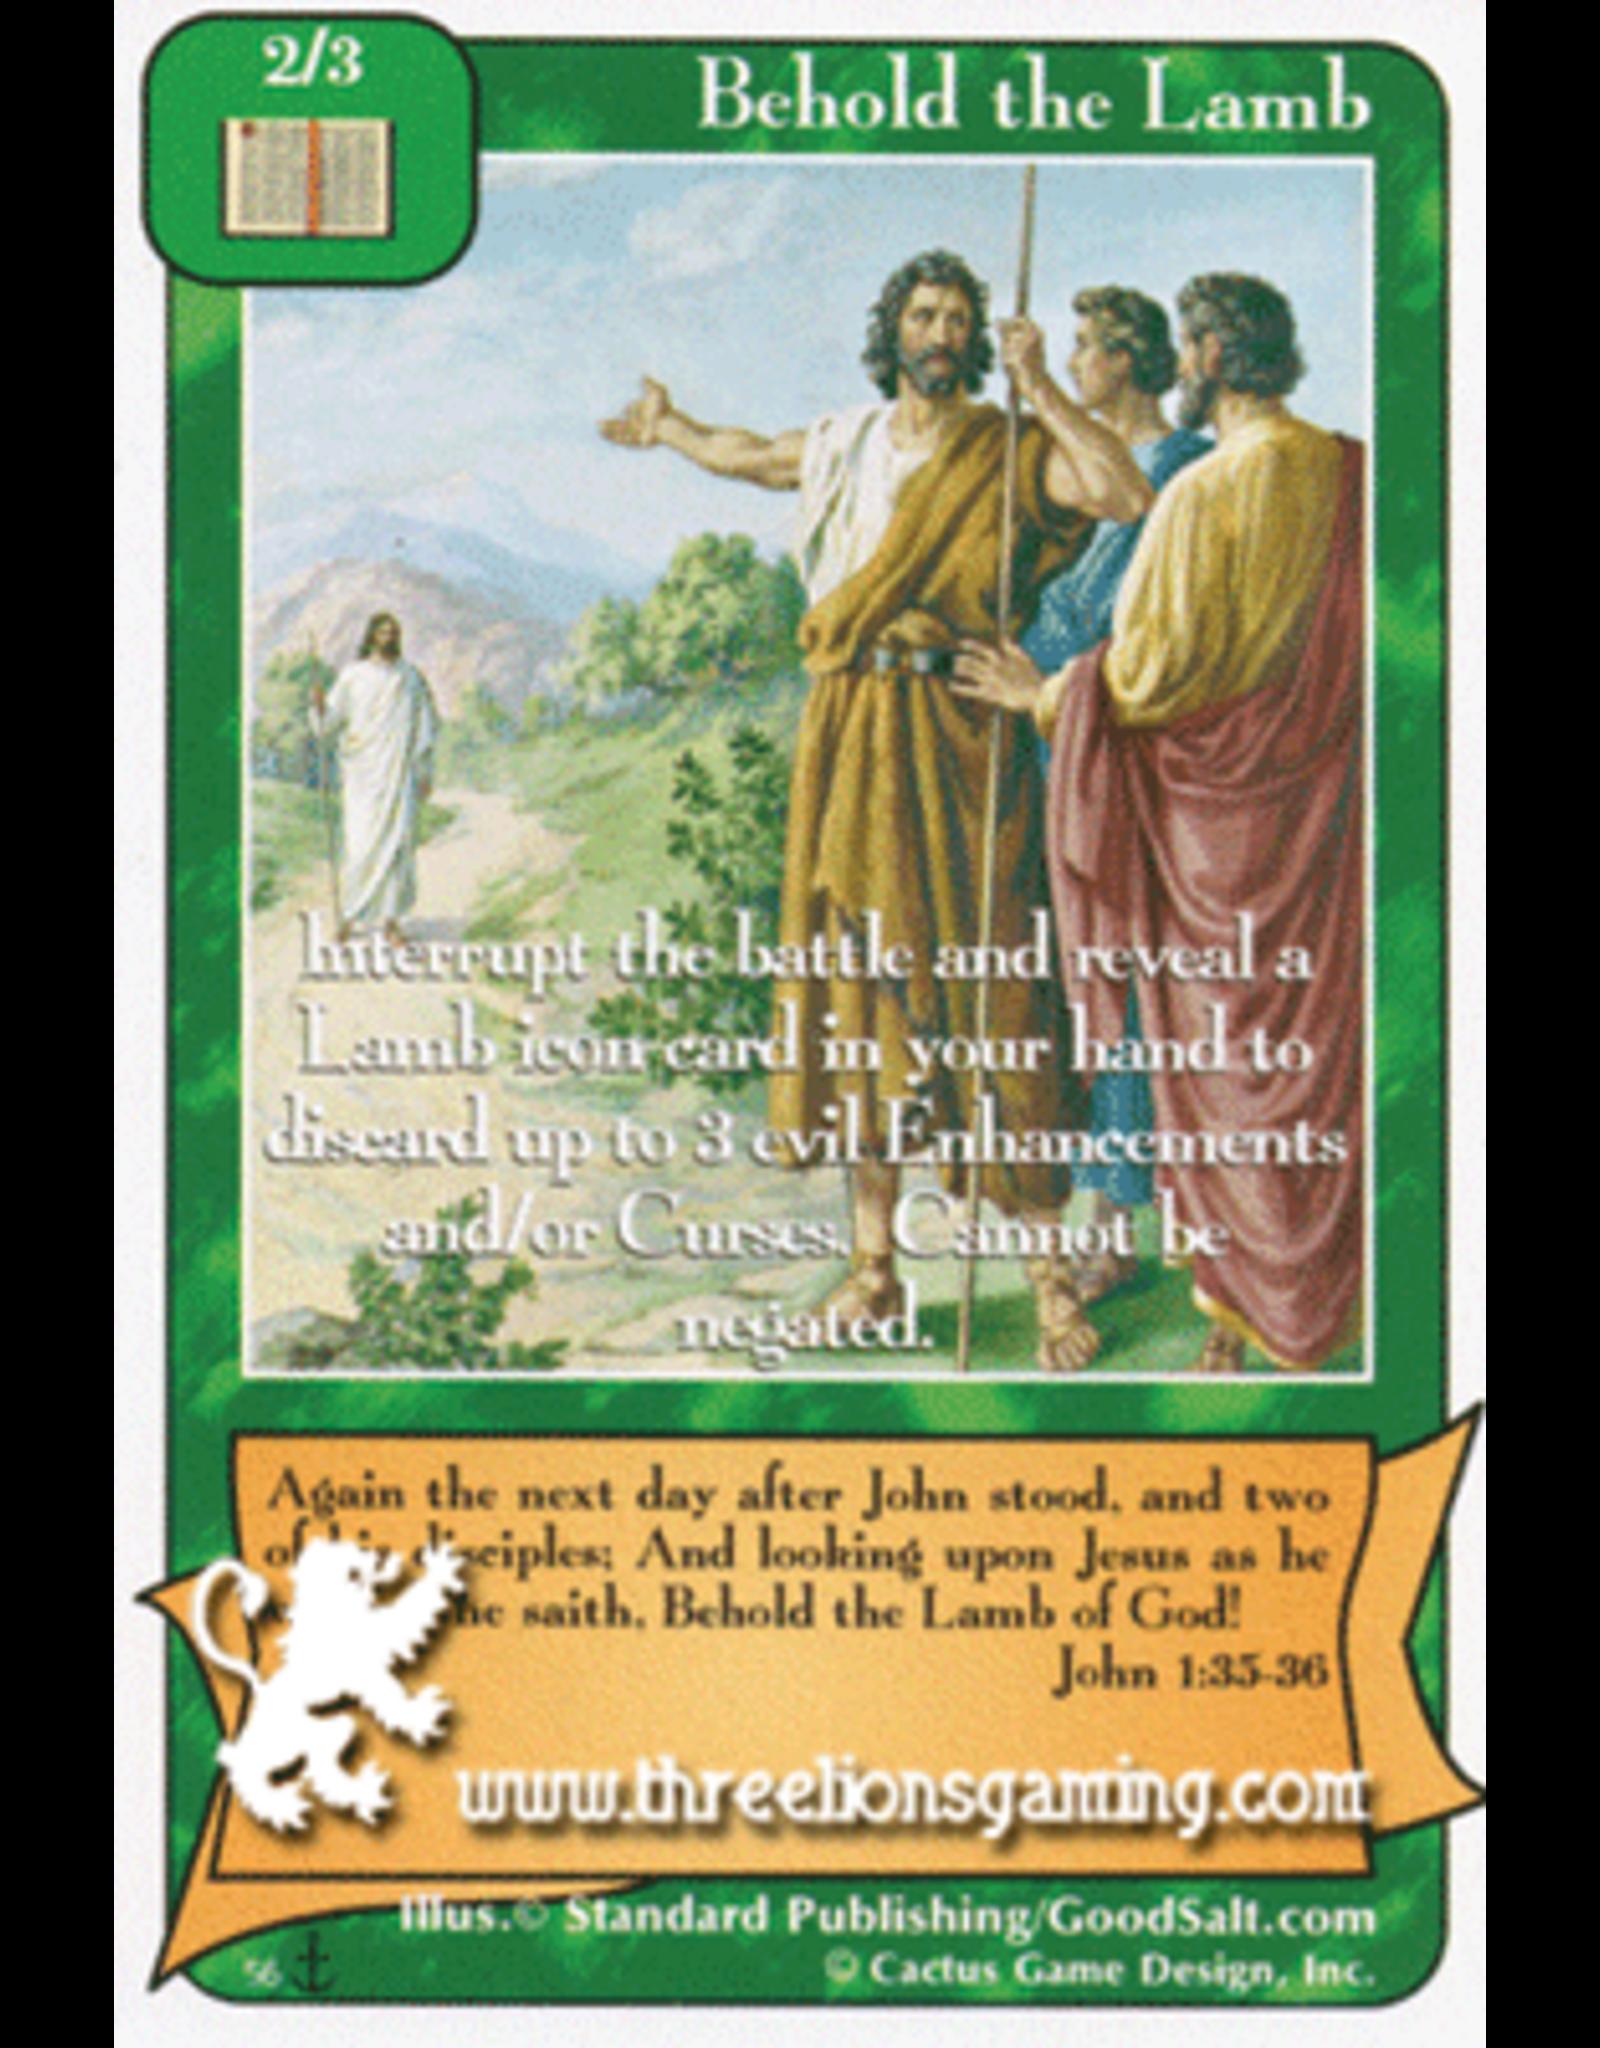 Behold the Lamb (Di)